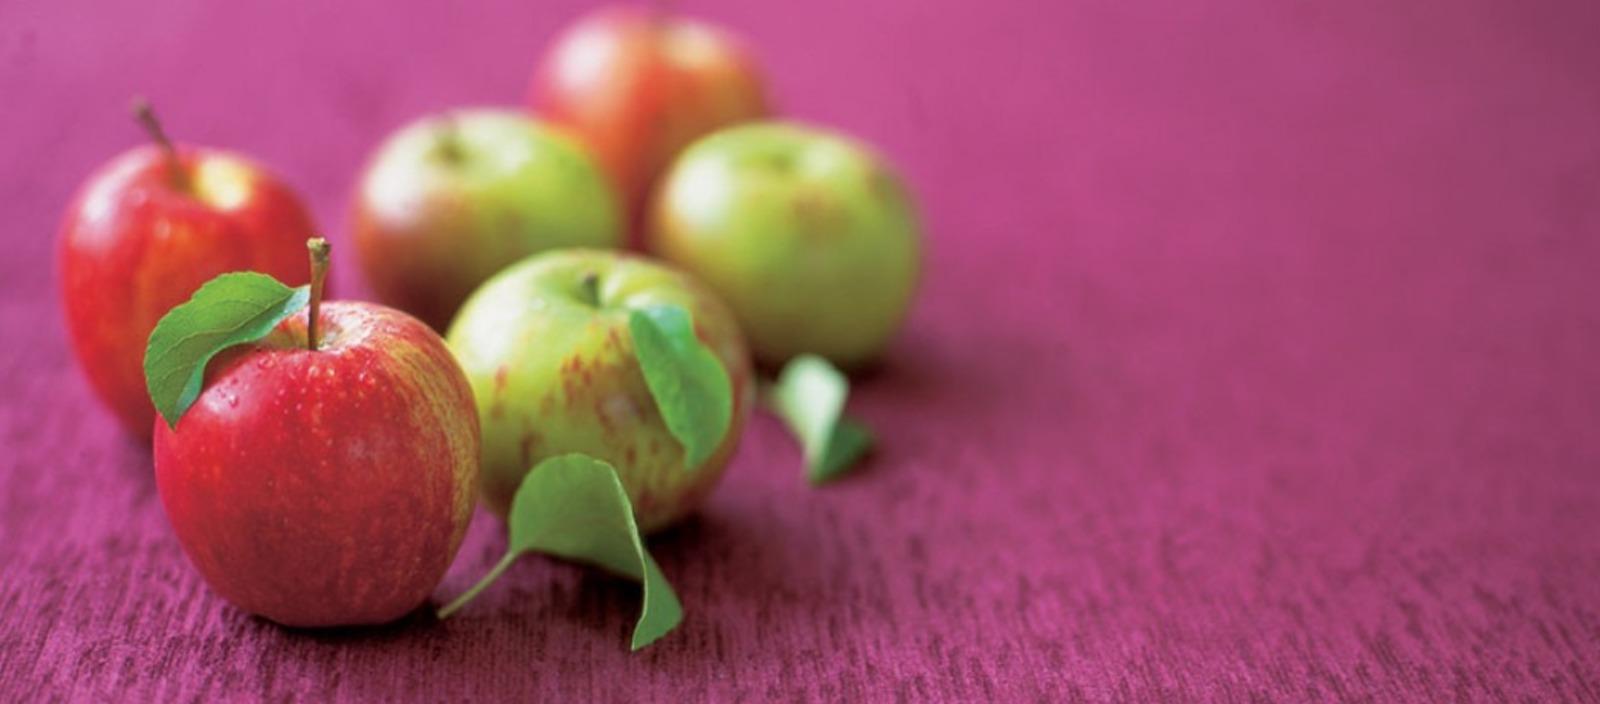 Apple pressing to make apple juice apples